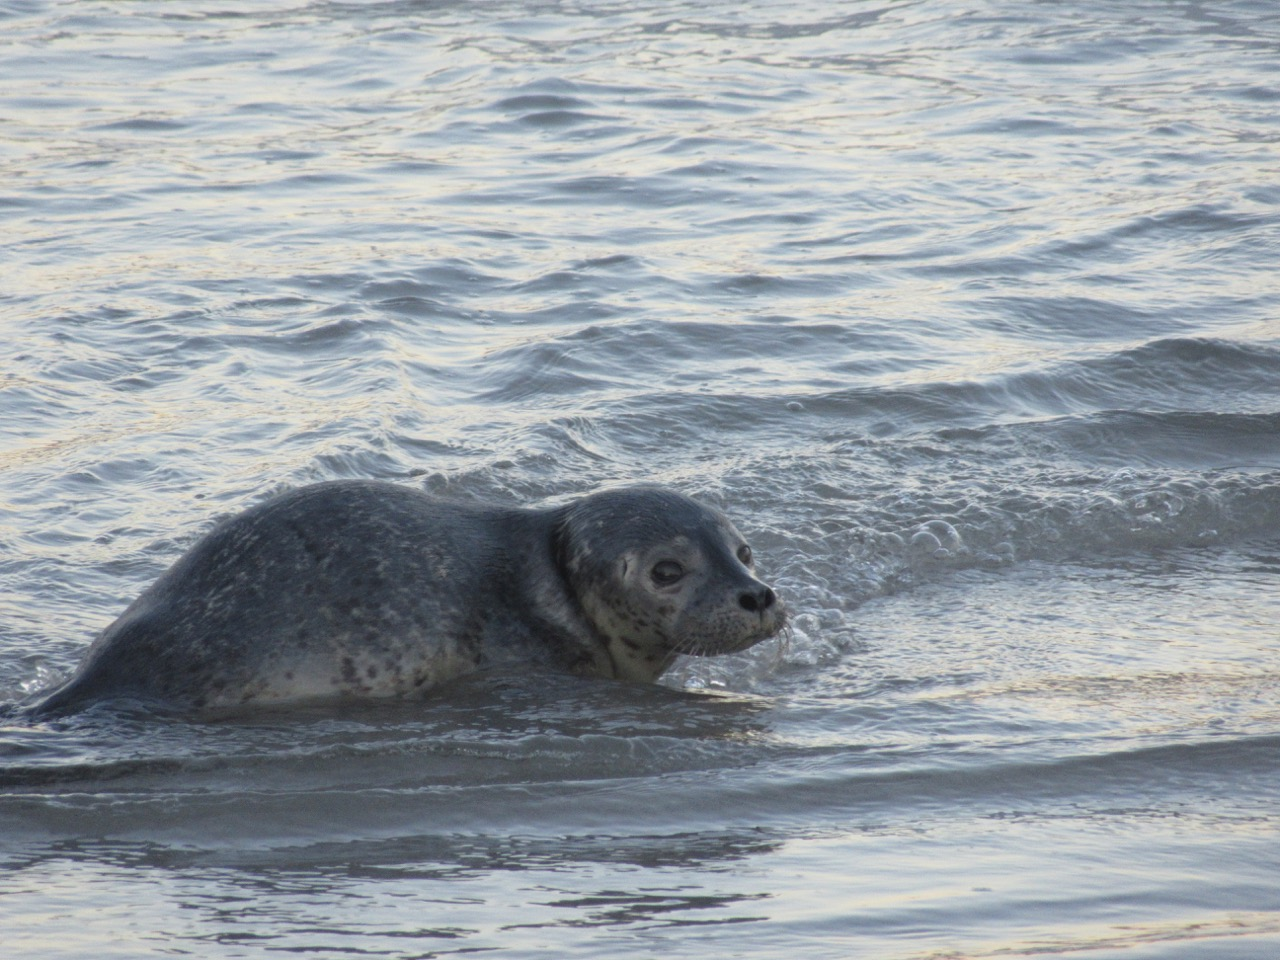 Seal Pup-one last look